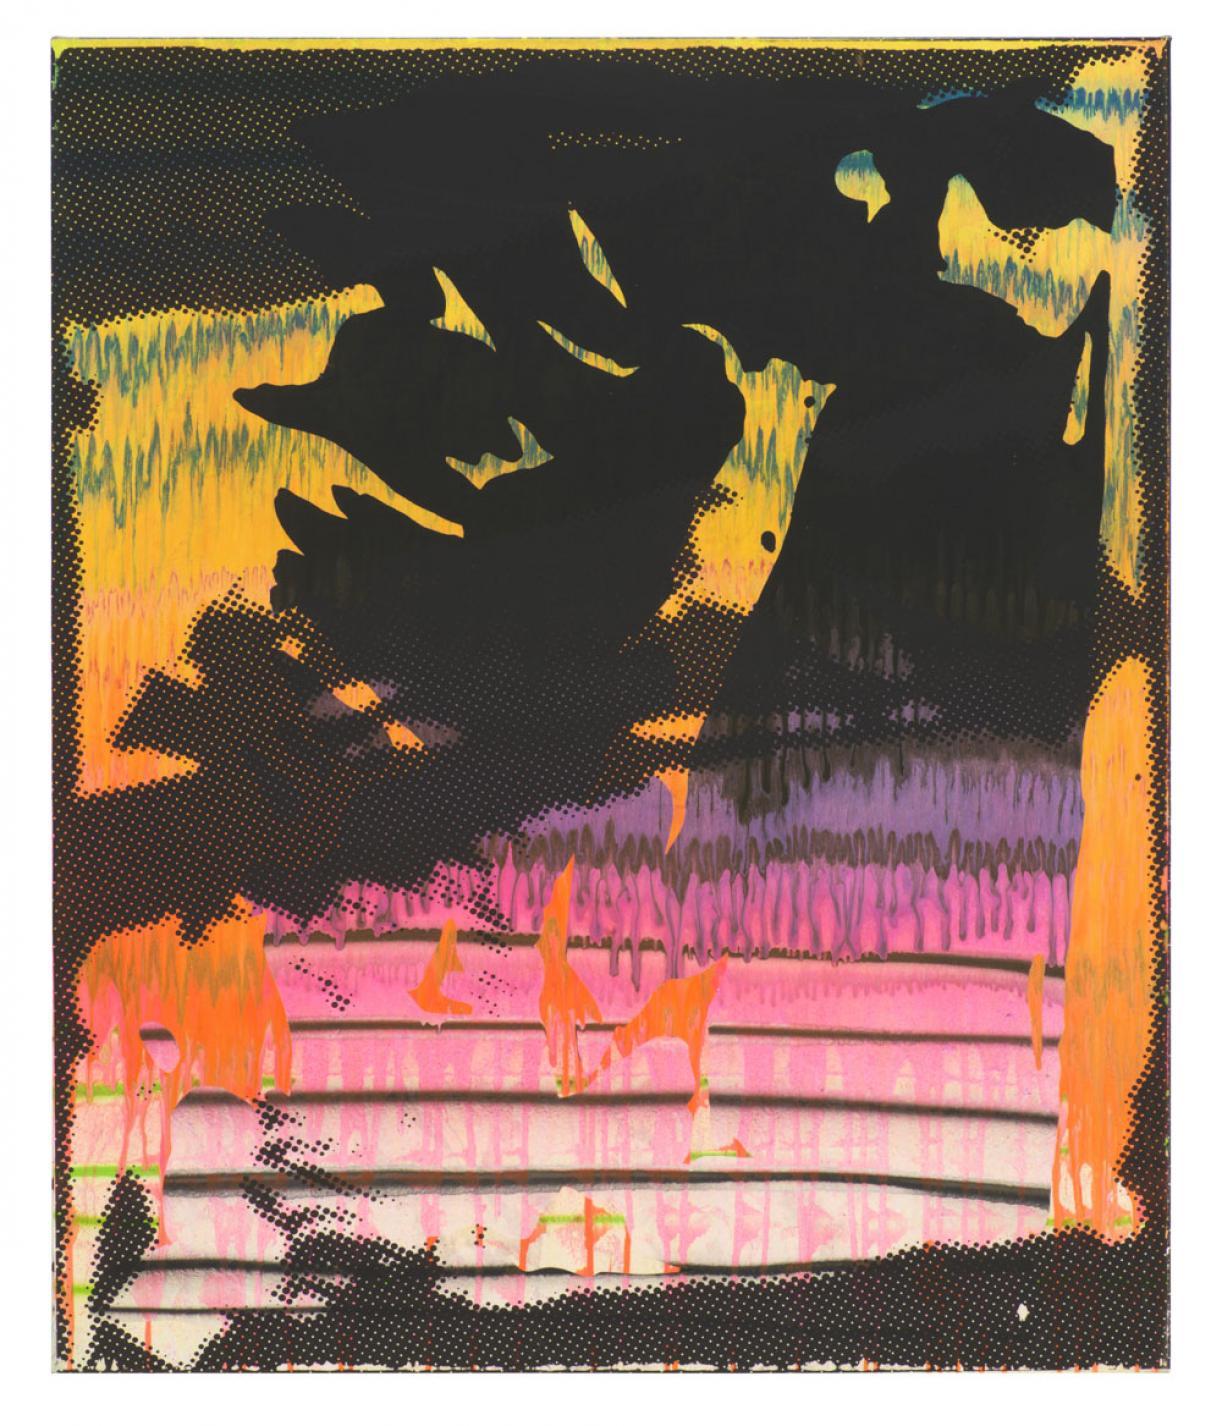 Christine Streuli, Cliff, 2018, Mixed media on canvas, 120x100cm, Unique